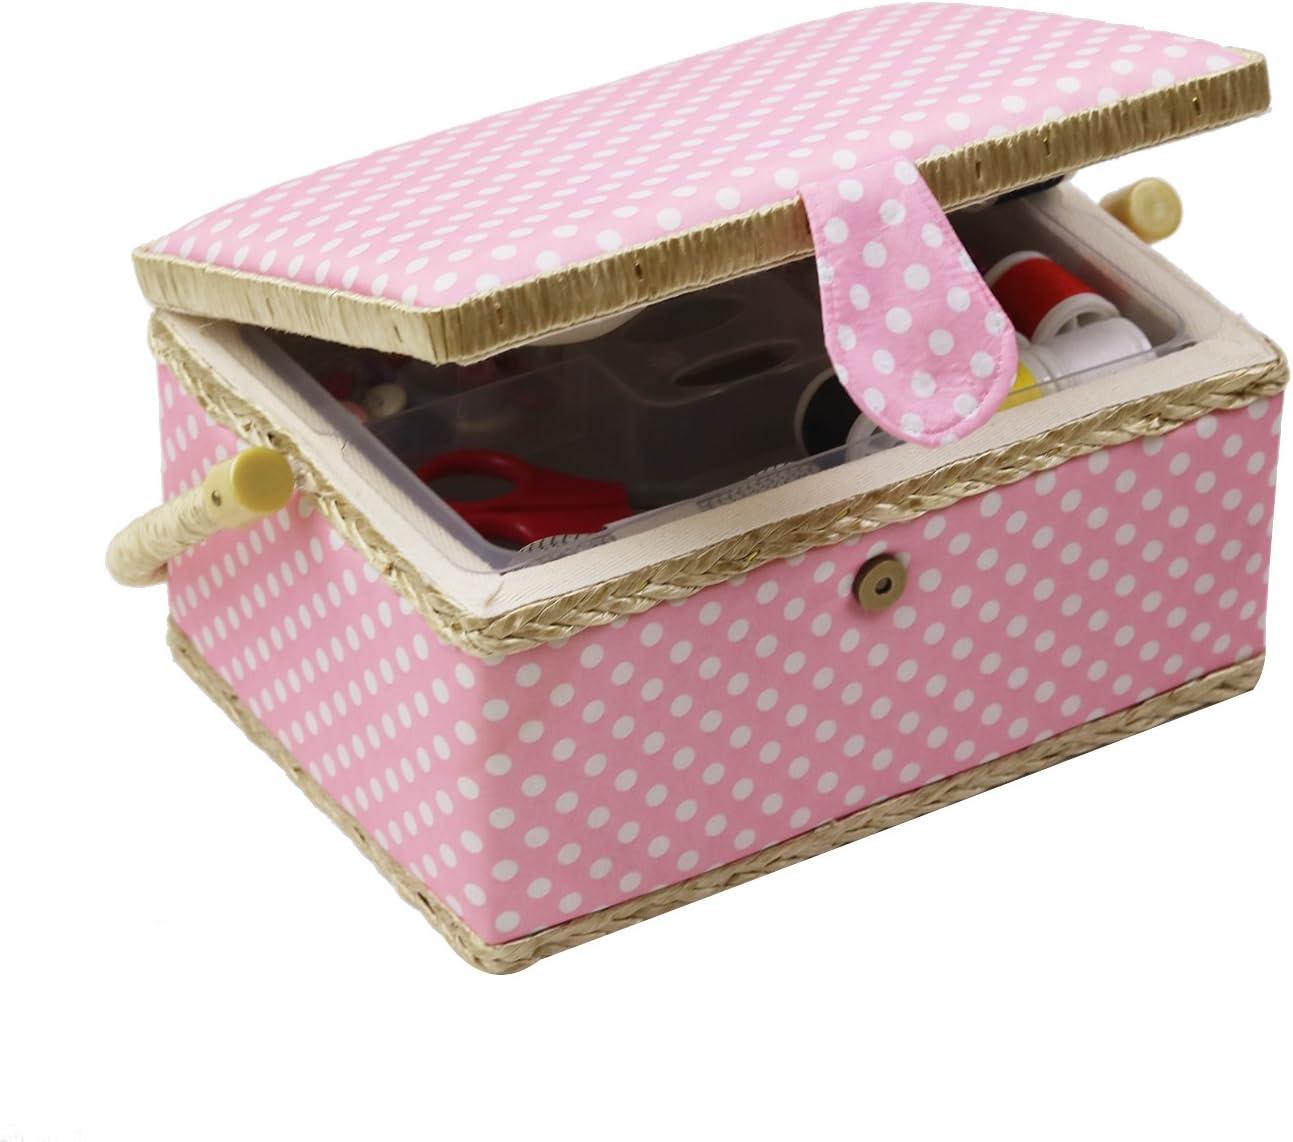 coser kits regalo Medium rosa D /& D caja de costura cesta organizador con accesorios hogar caja de costura Kit de costura b/ásicos para hogar y viaje